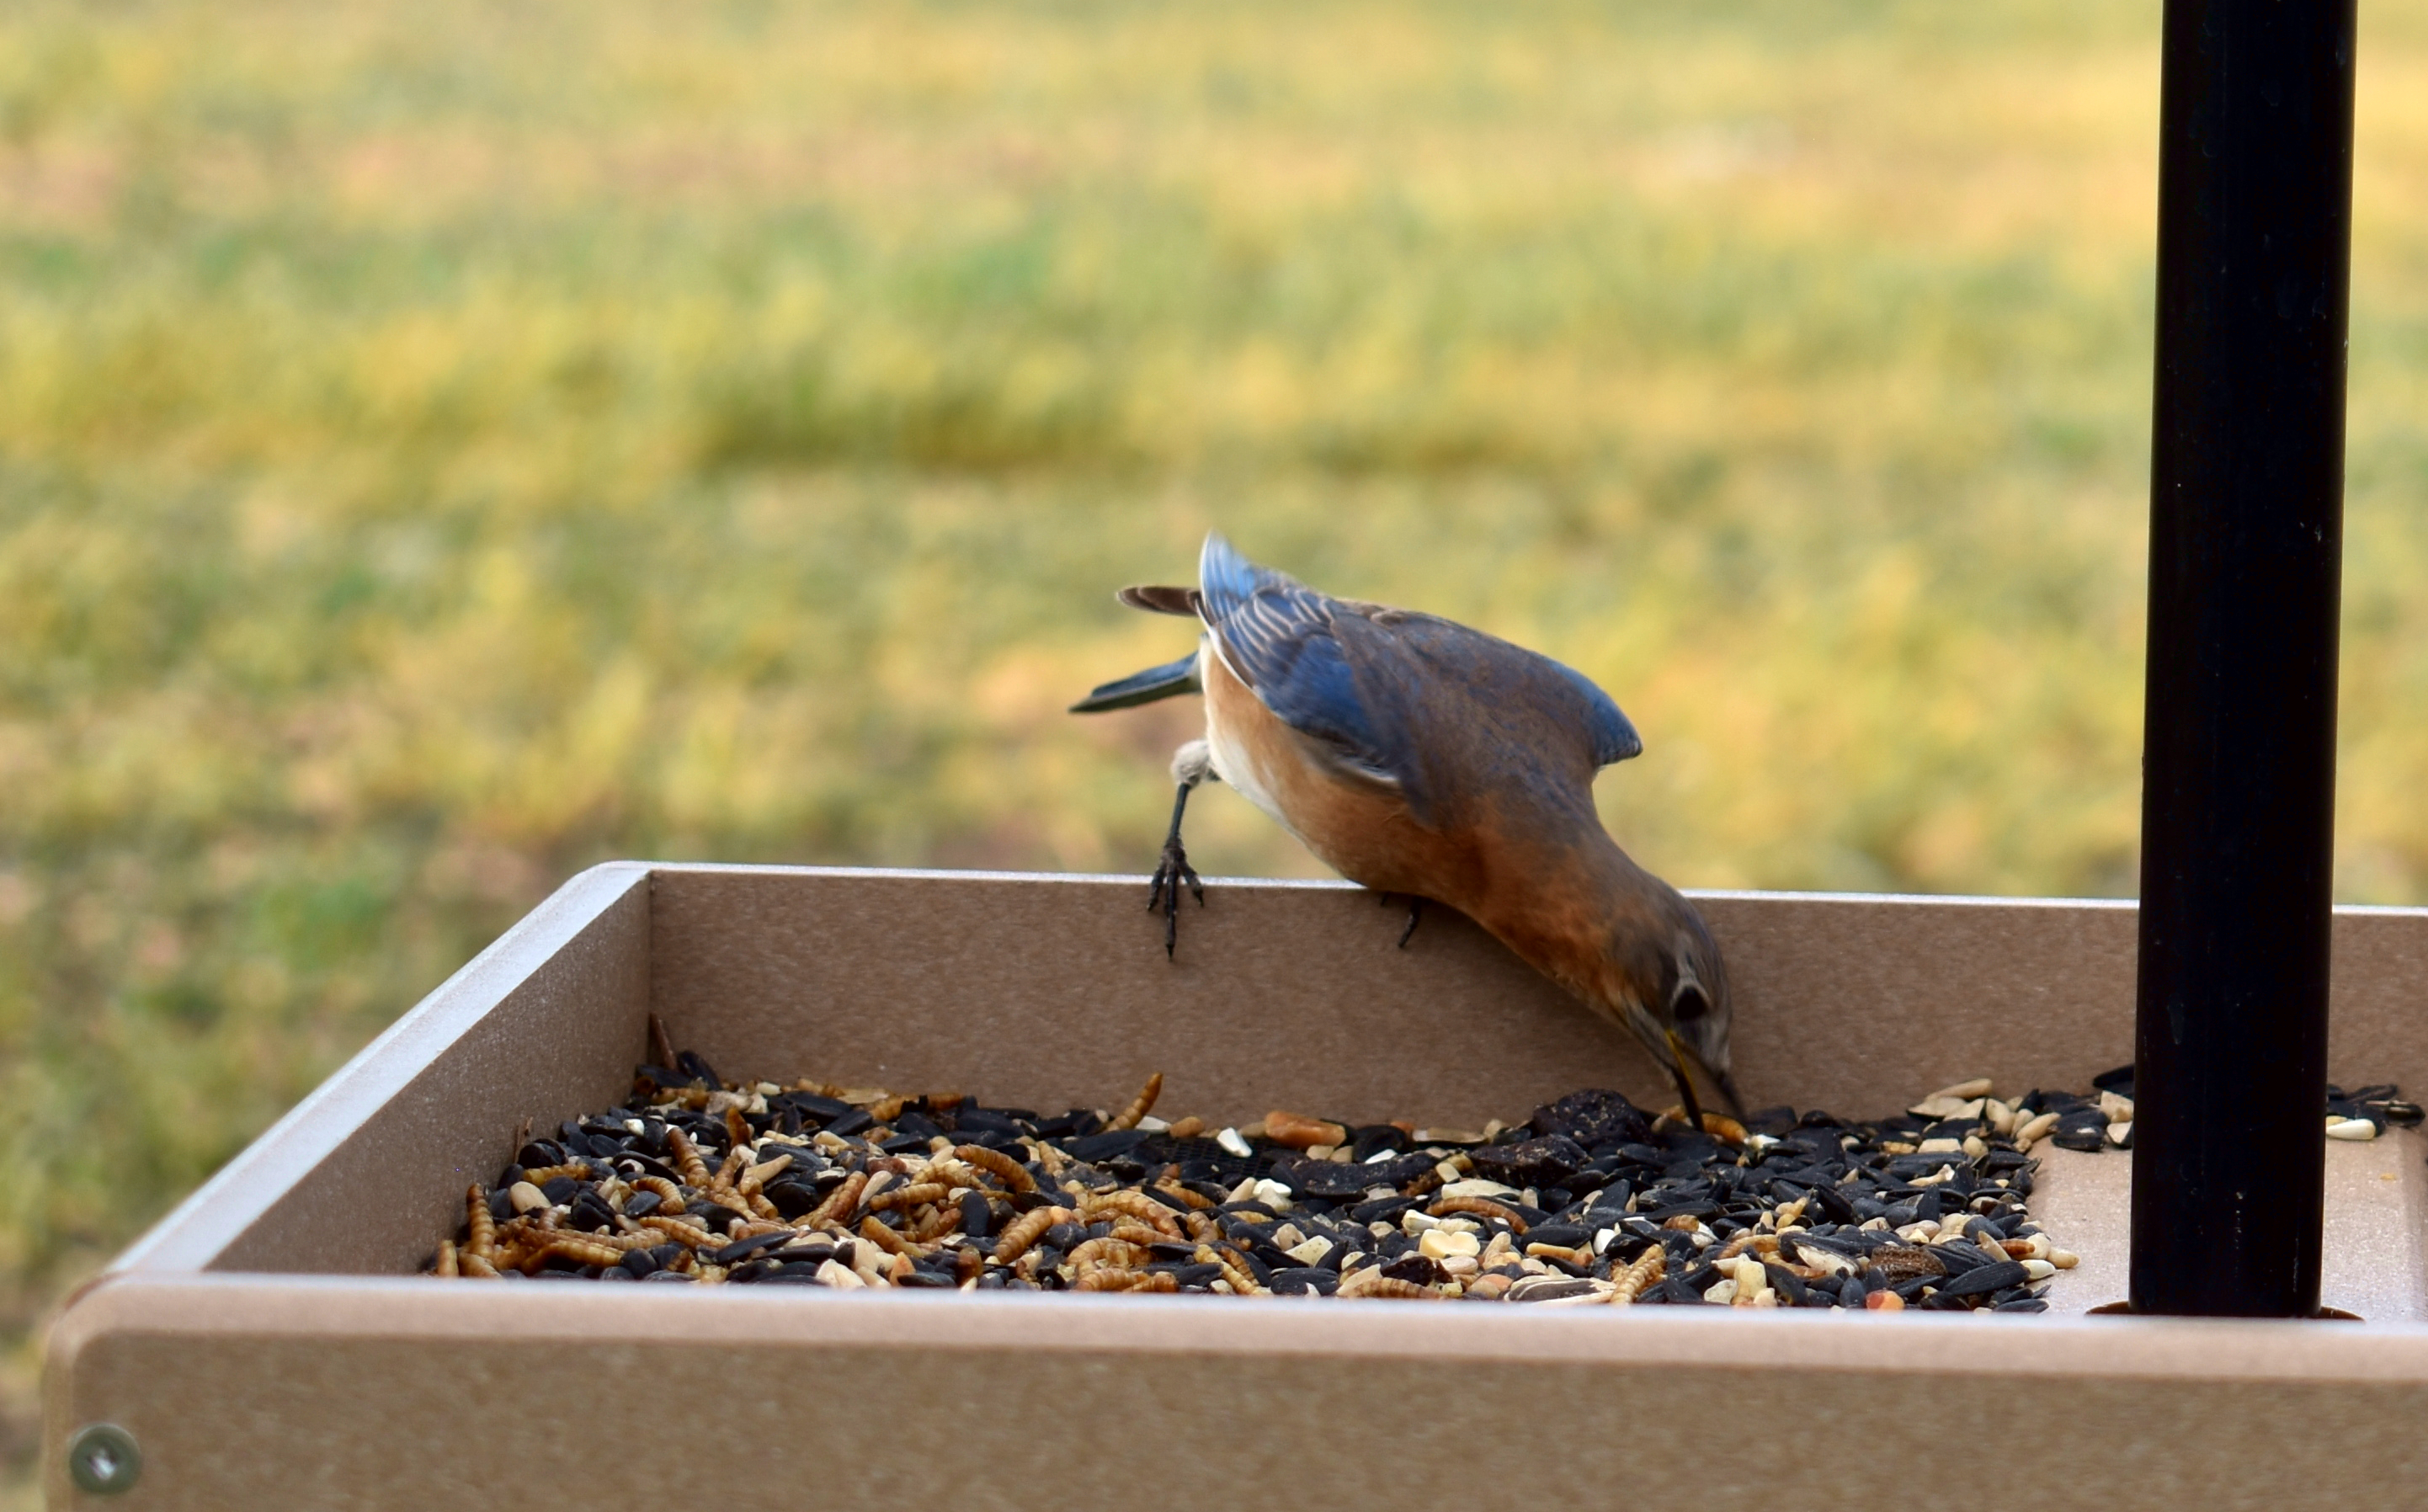 Eastern Bluebird Eating a Worm